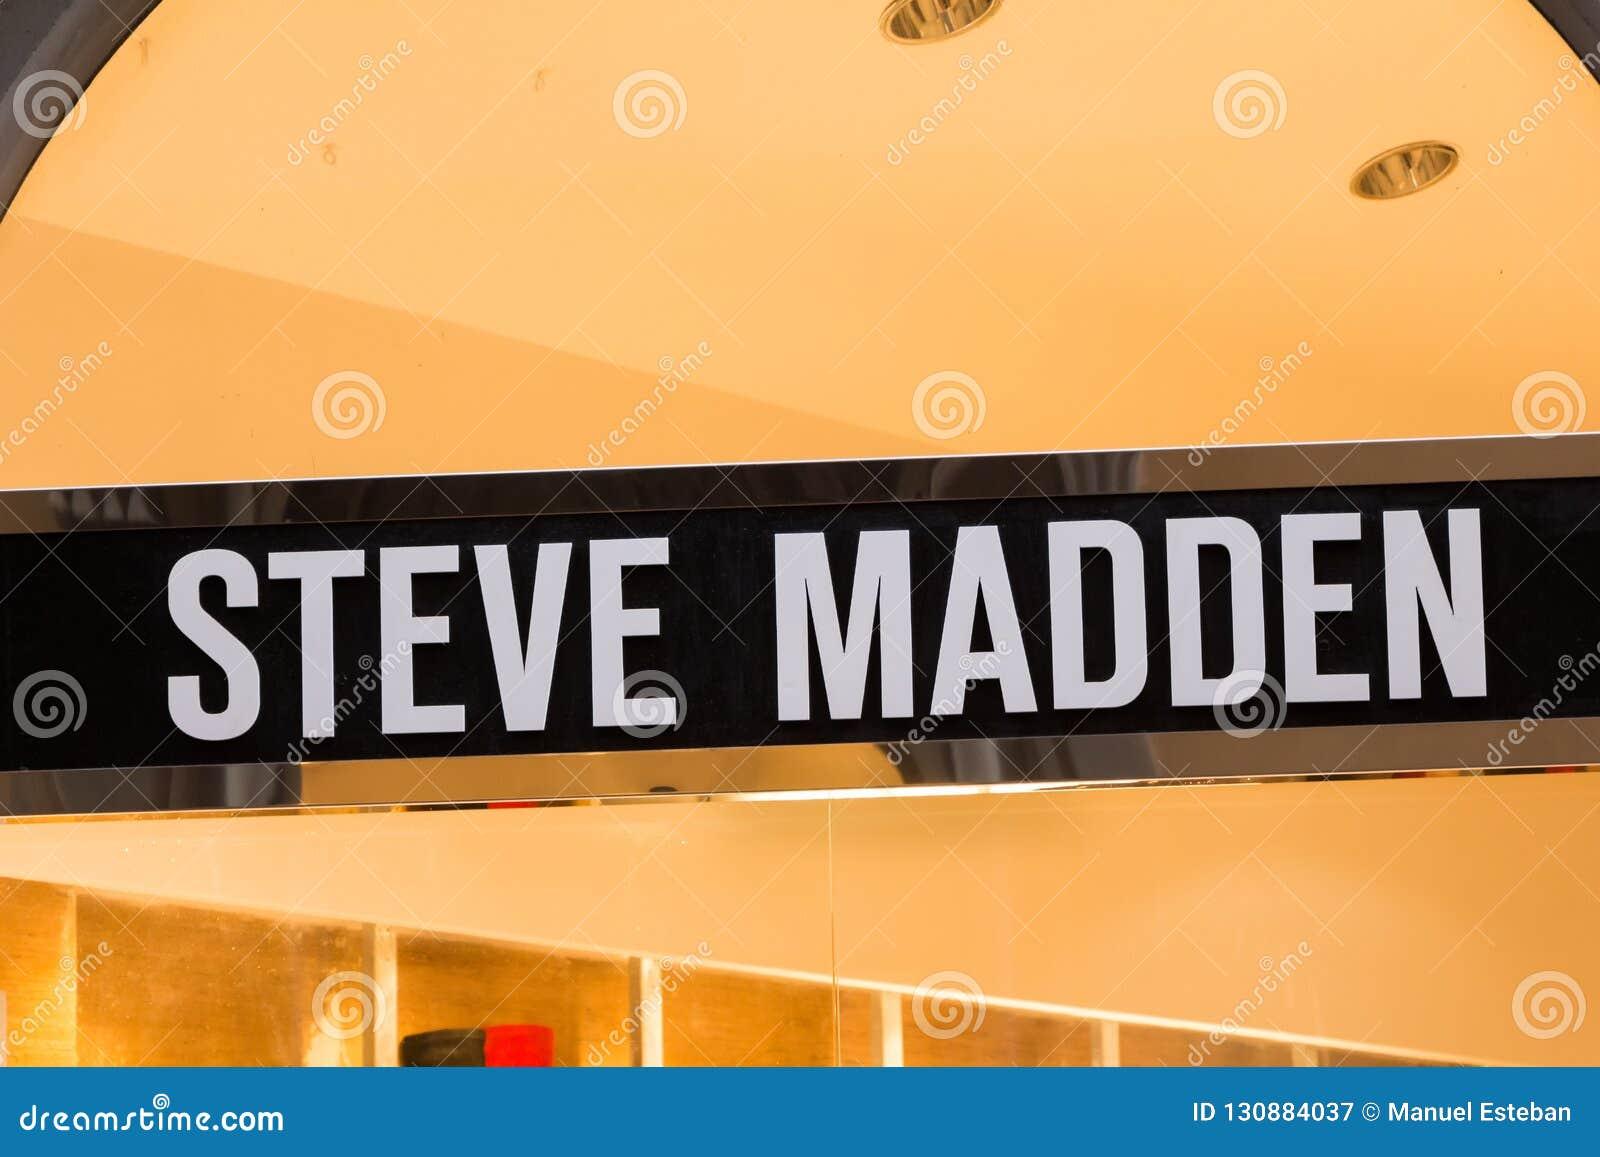 950245a8a1b Steve Madden Logo On Steve Madden`s Shop Editorial Photography ...